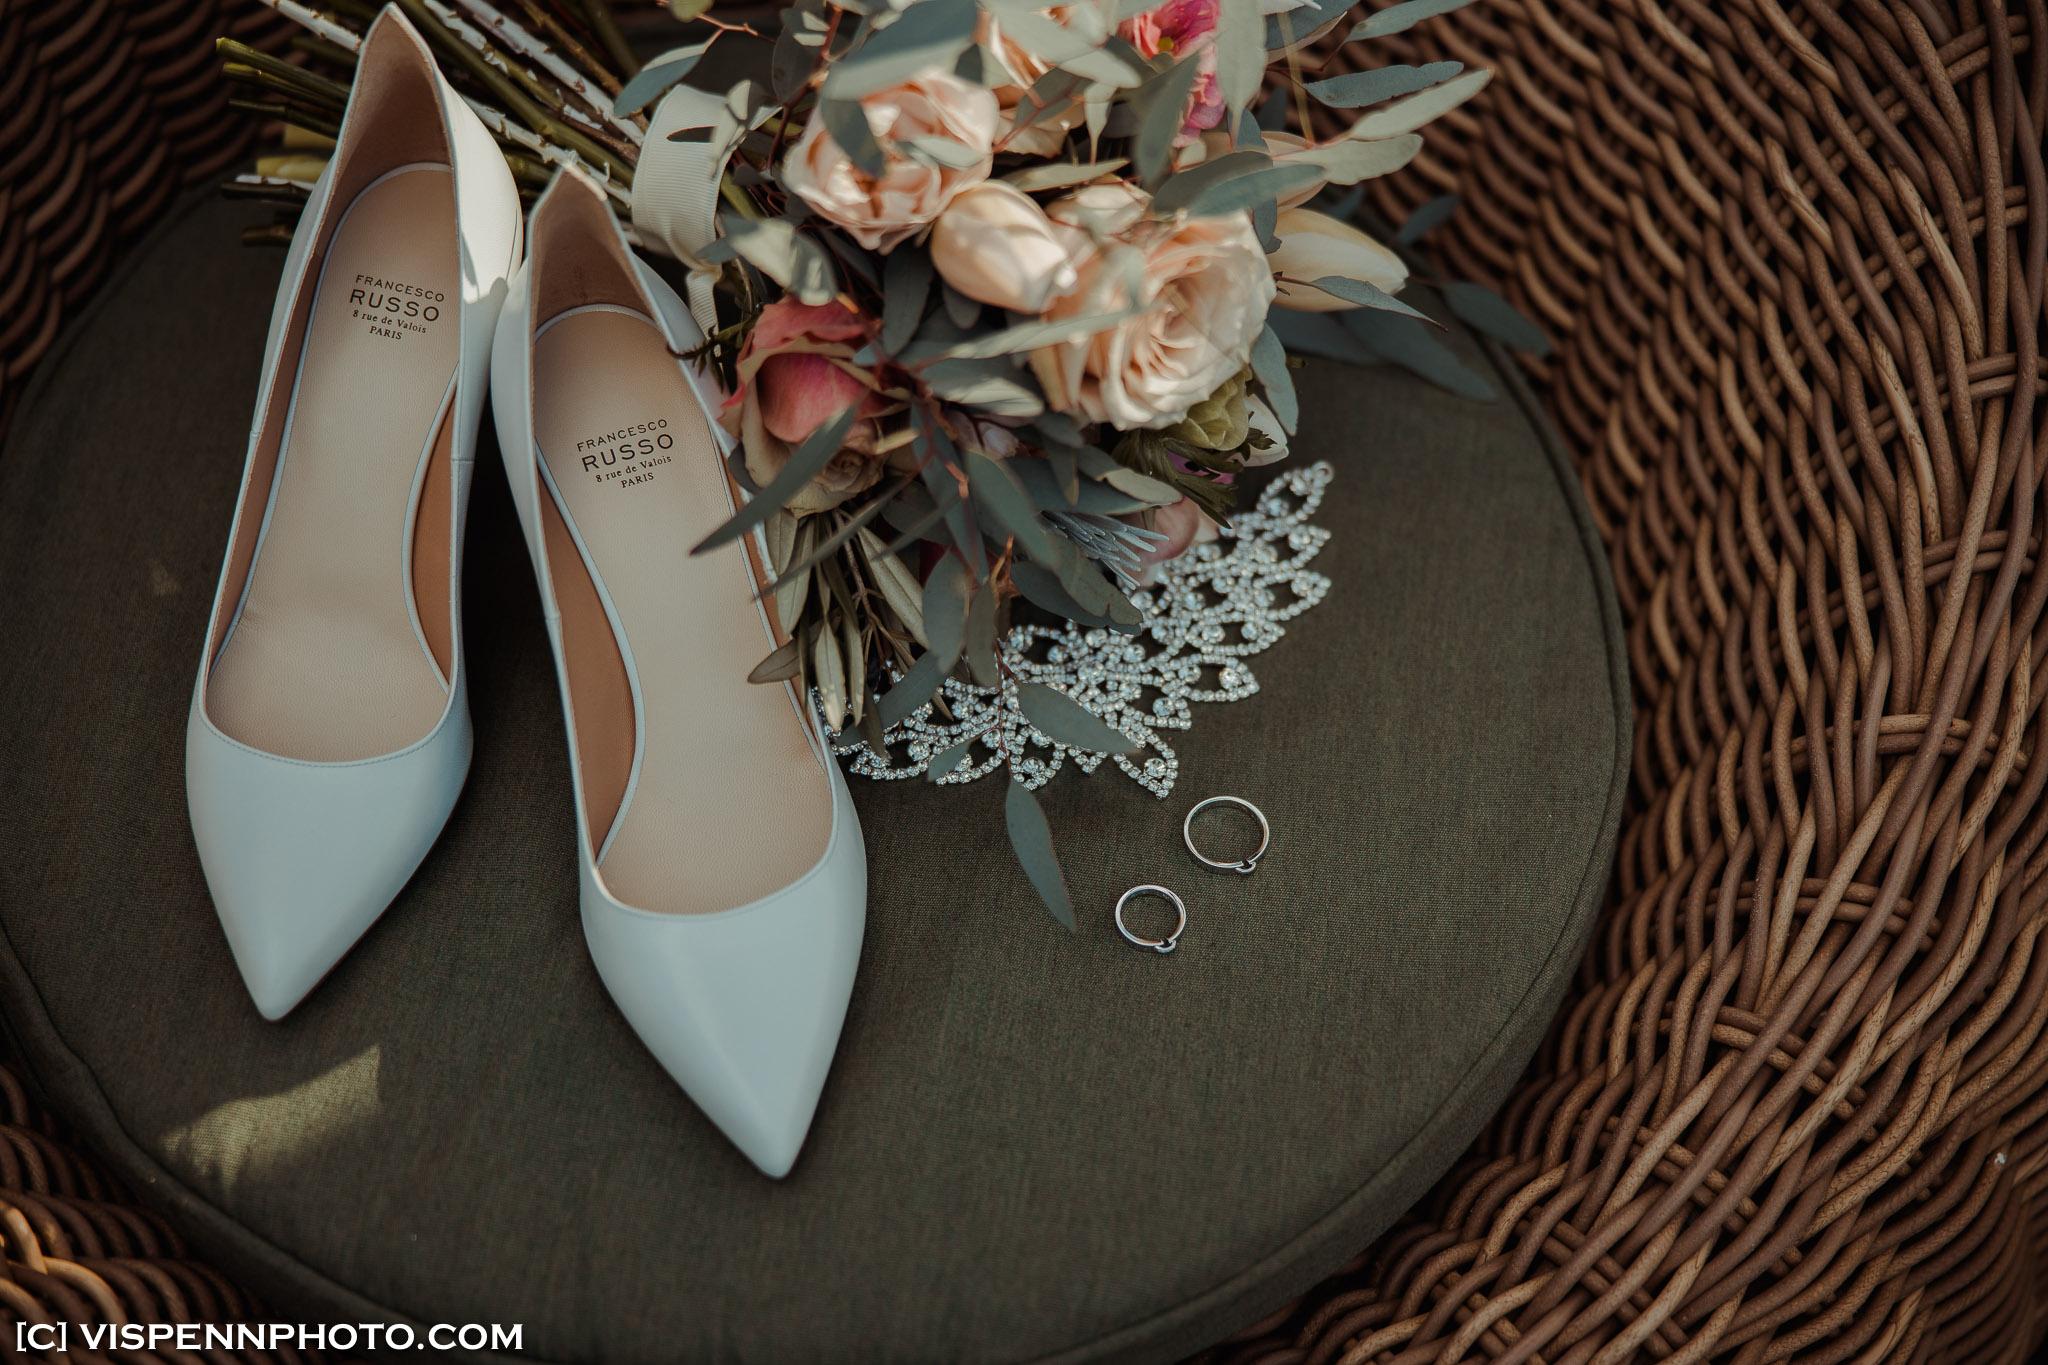 WEDDING DAY Photography Melbourne VISPENN 墨尔本 婚礼跟拍 婚礼摄像 婚礼摄影 结婚照 登记照 CoreyCoco 1P 01786 EOSR VISPENN